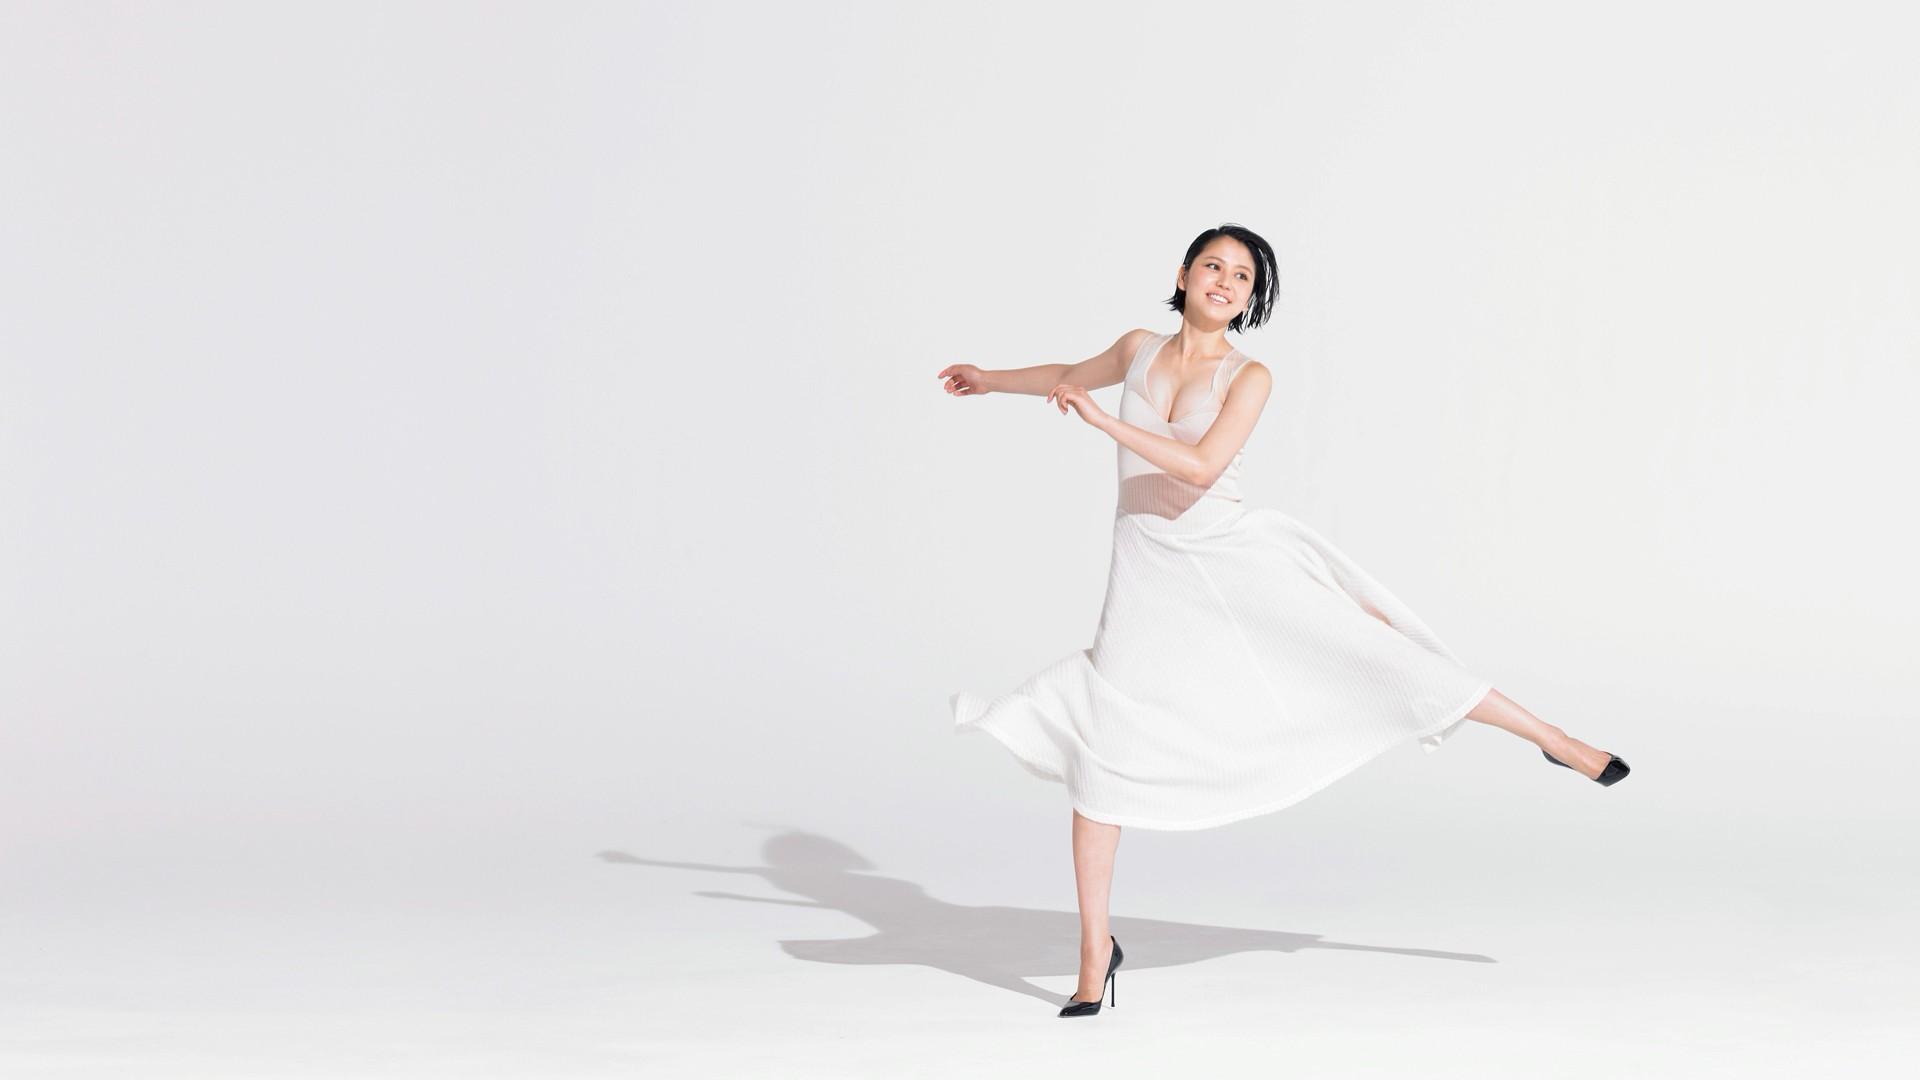 Robe blanche danse moderne